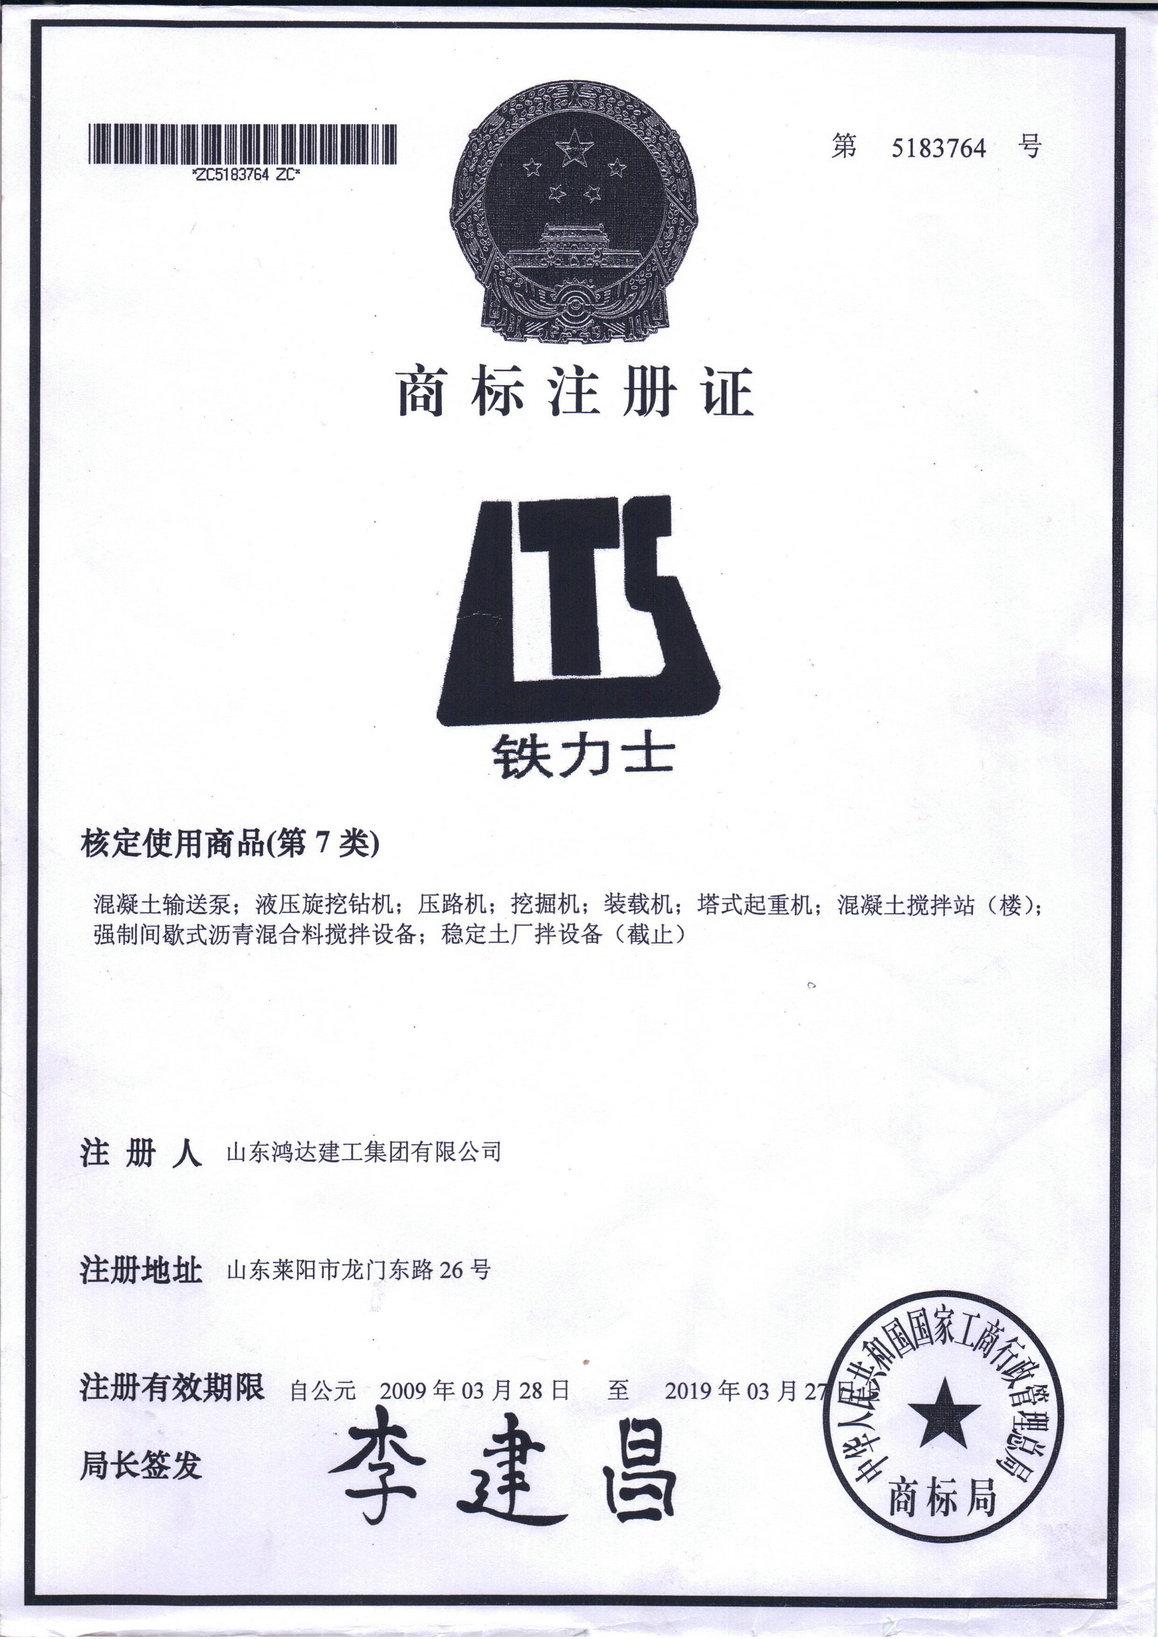 certificate of logo registration